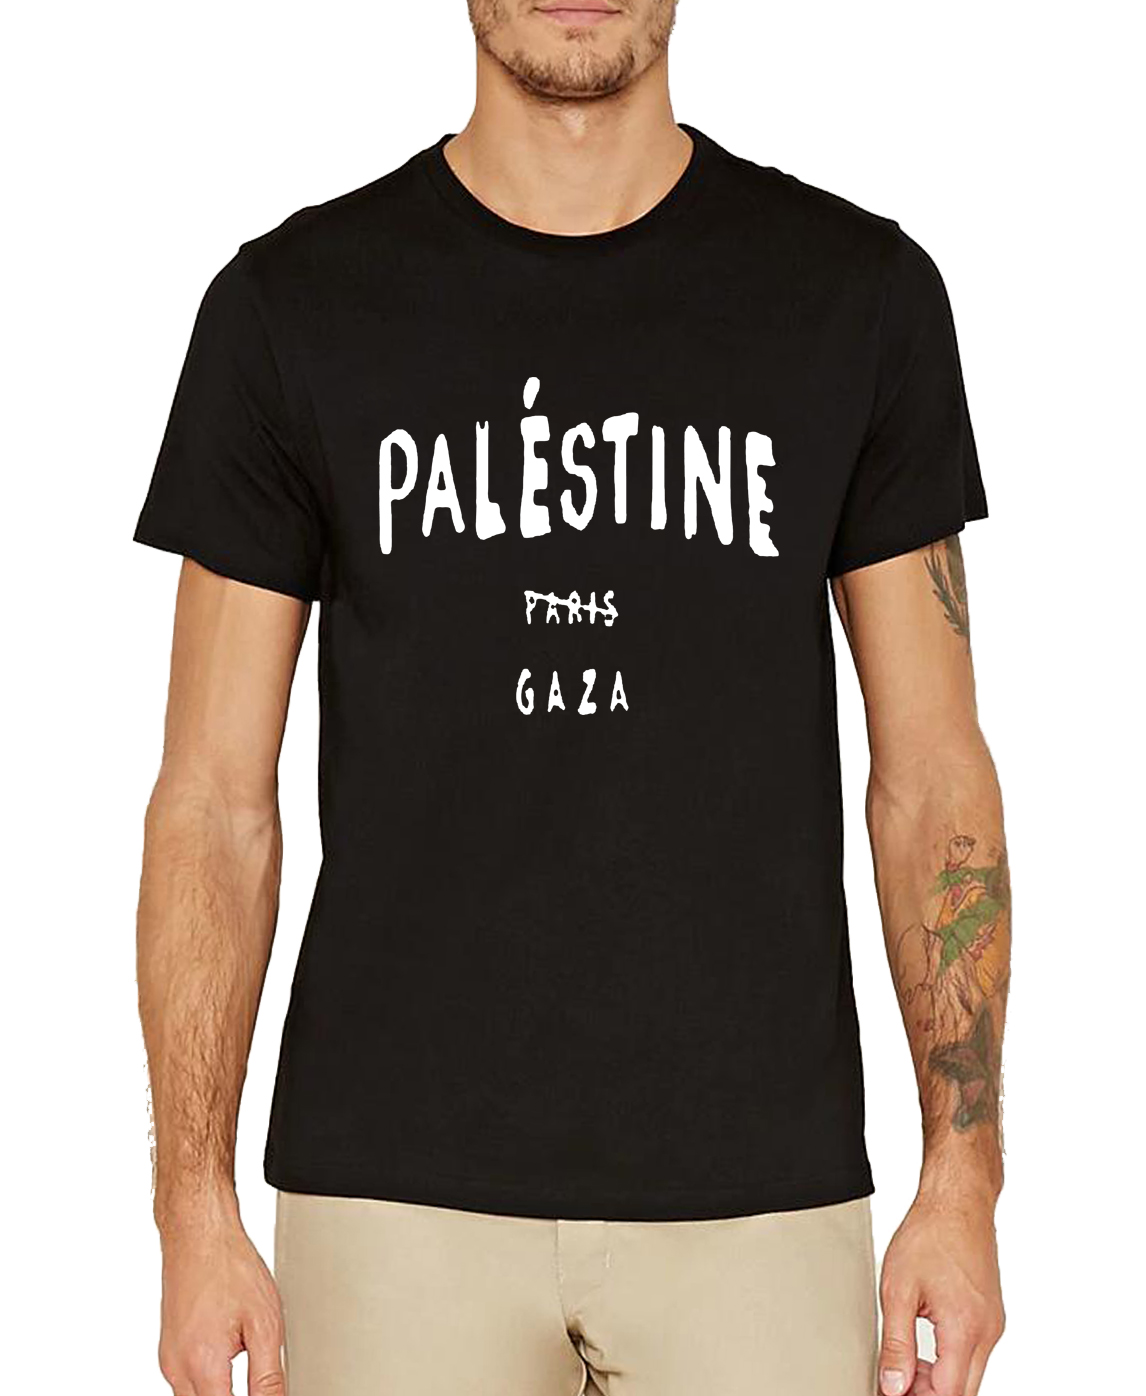 2019 Summer men Design T shirt fashion cotton print tee shirt homme o-neck funny brand harajuku short sleeve top camisetas S-3XL